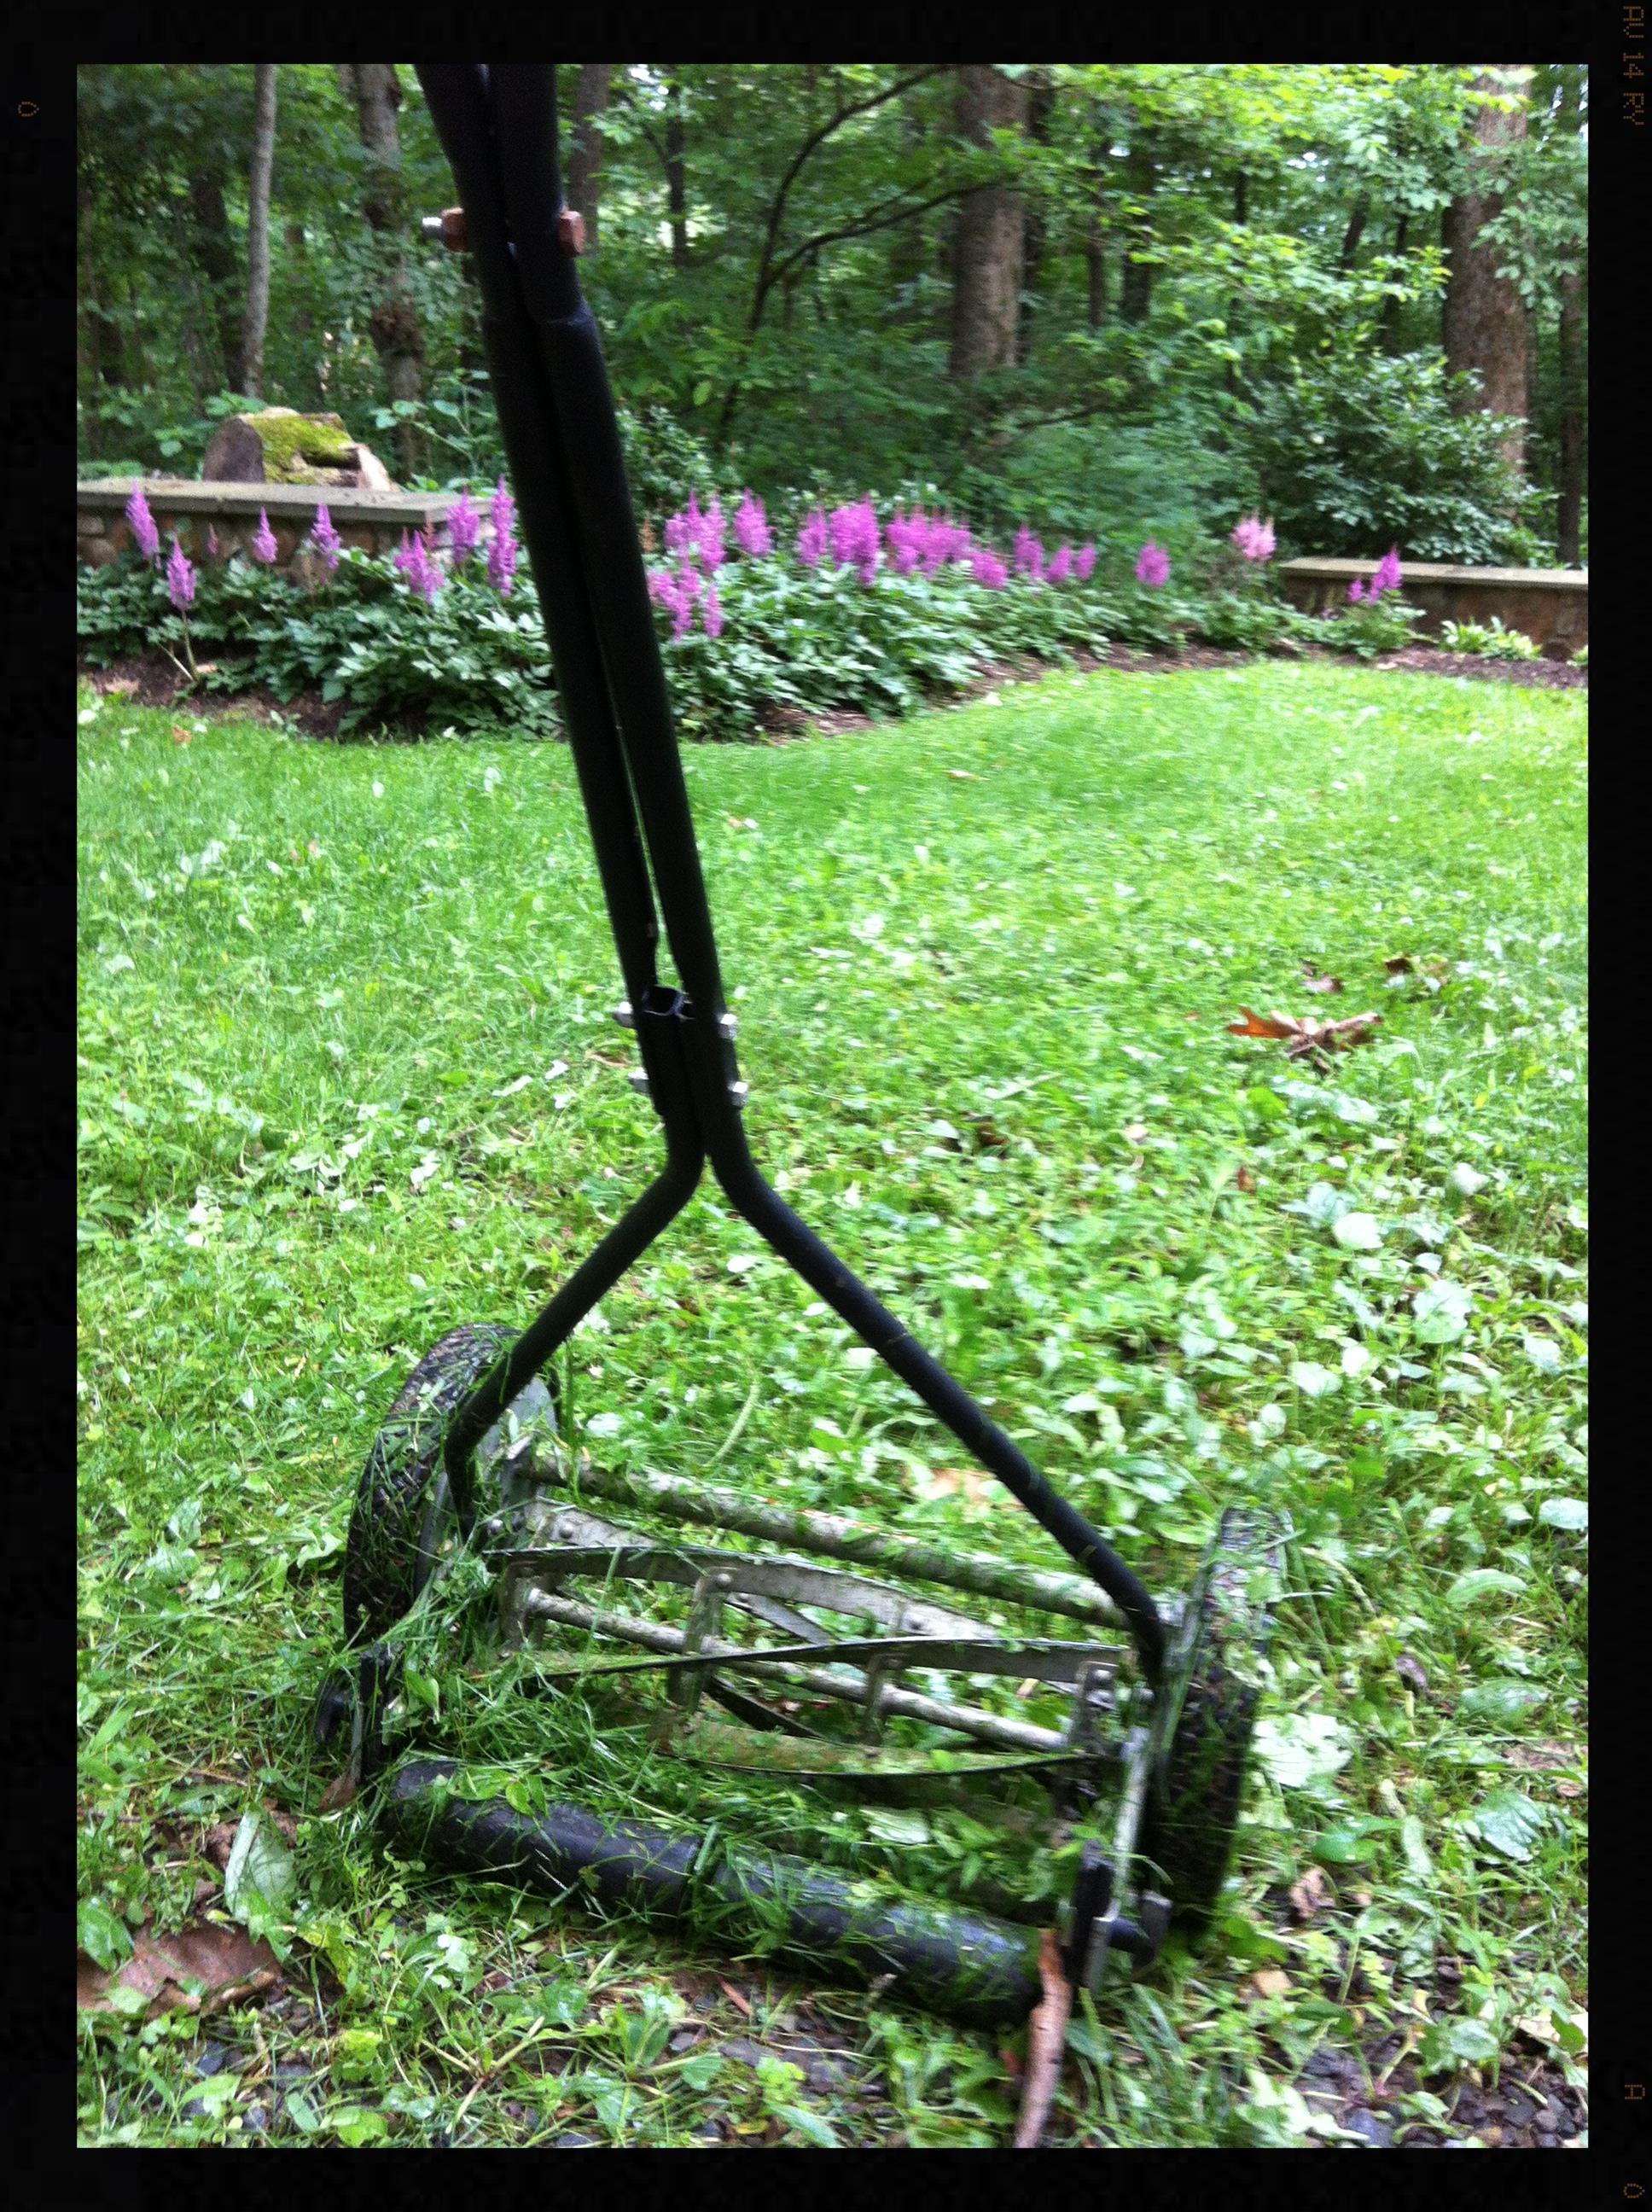 My reel mower at Sweetspire.  Linden, VA  Photo by - Garth Woodruff